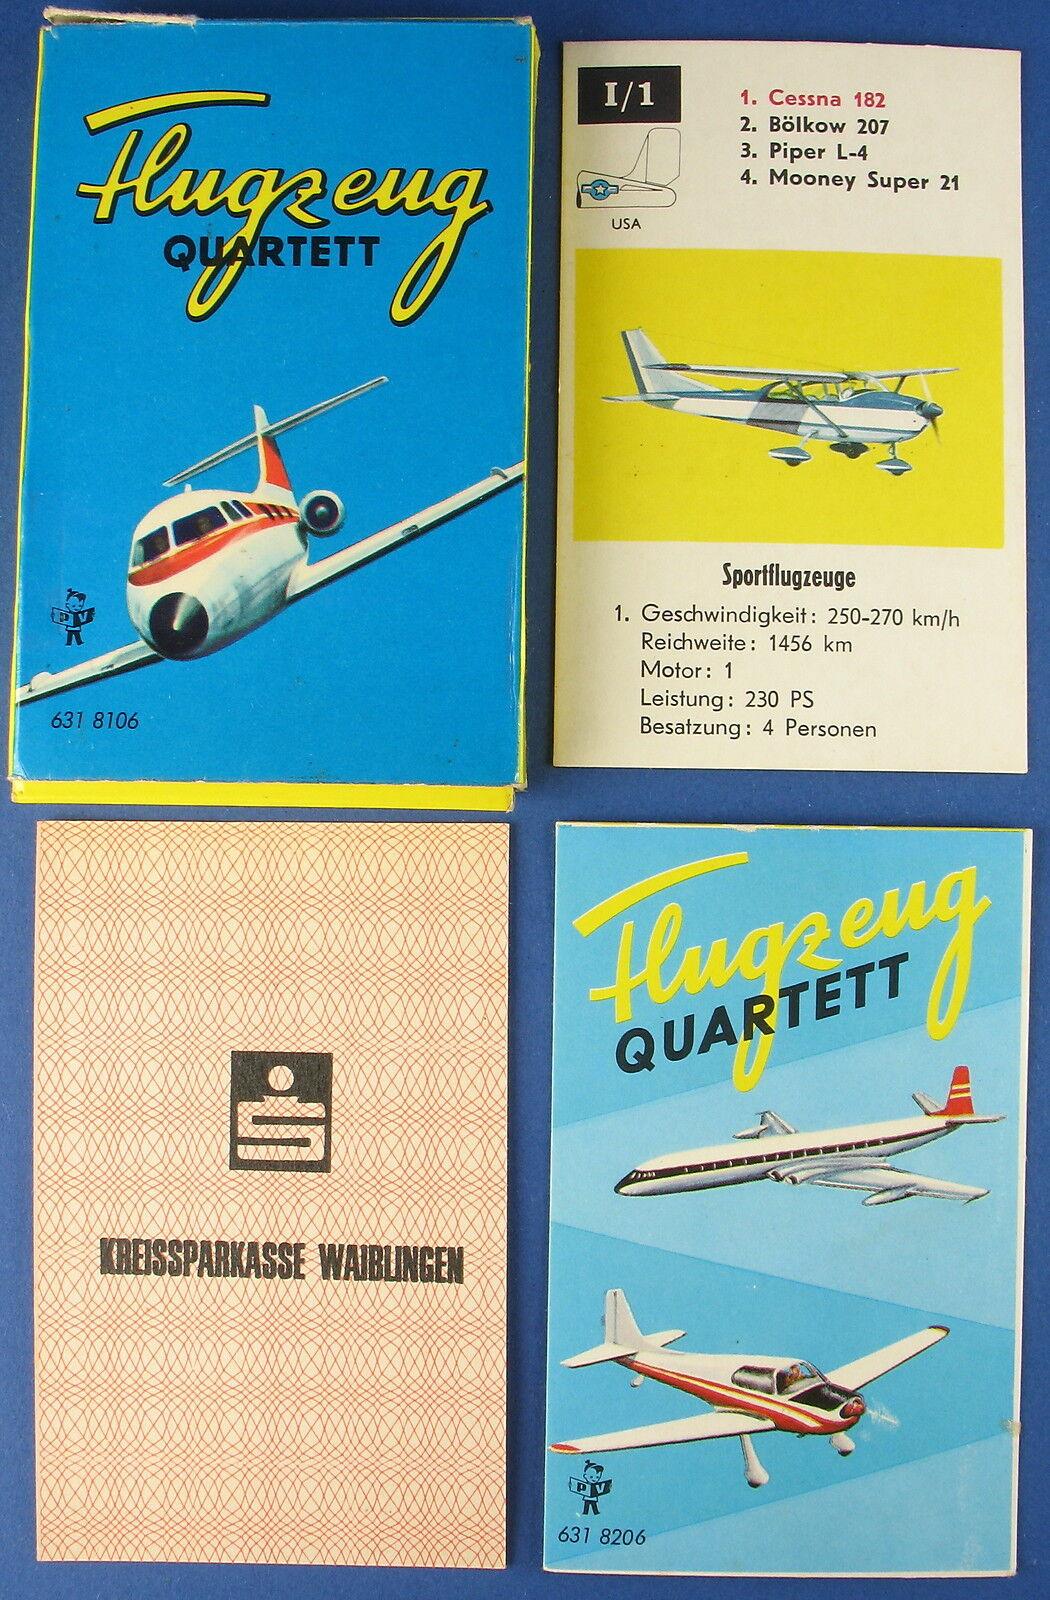 Werbe-Quartett - Flugzeug - Kreissparkasse WN - Pestalozzi Nr. 631 8106 - 1969